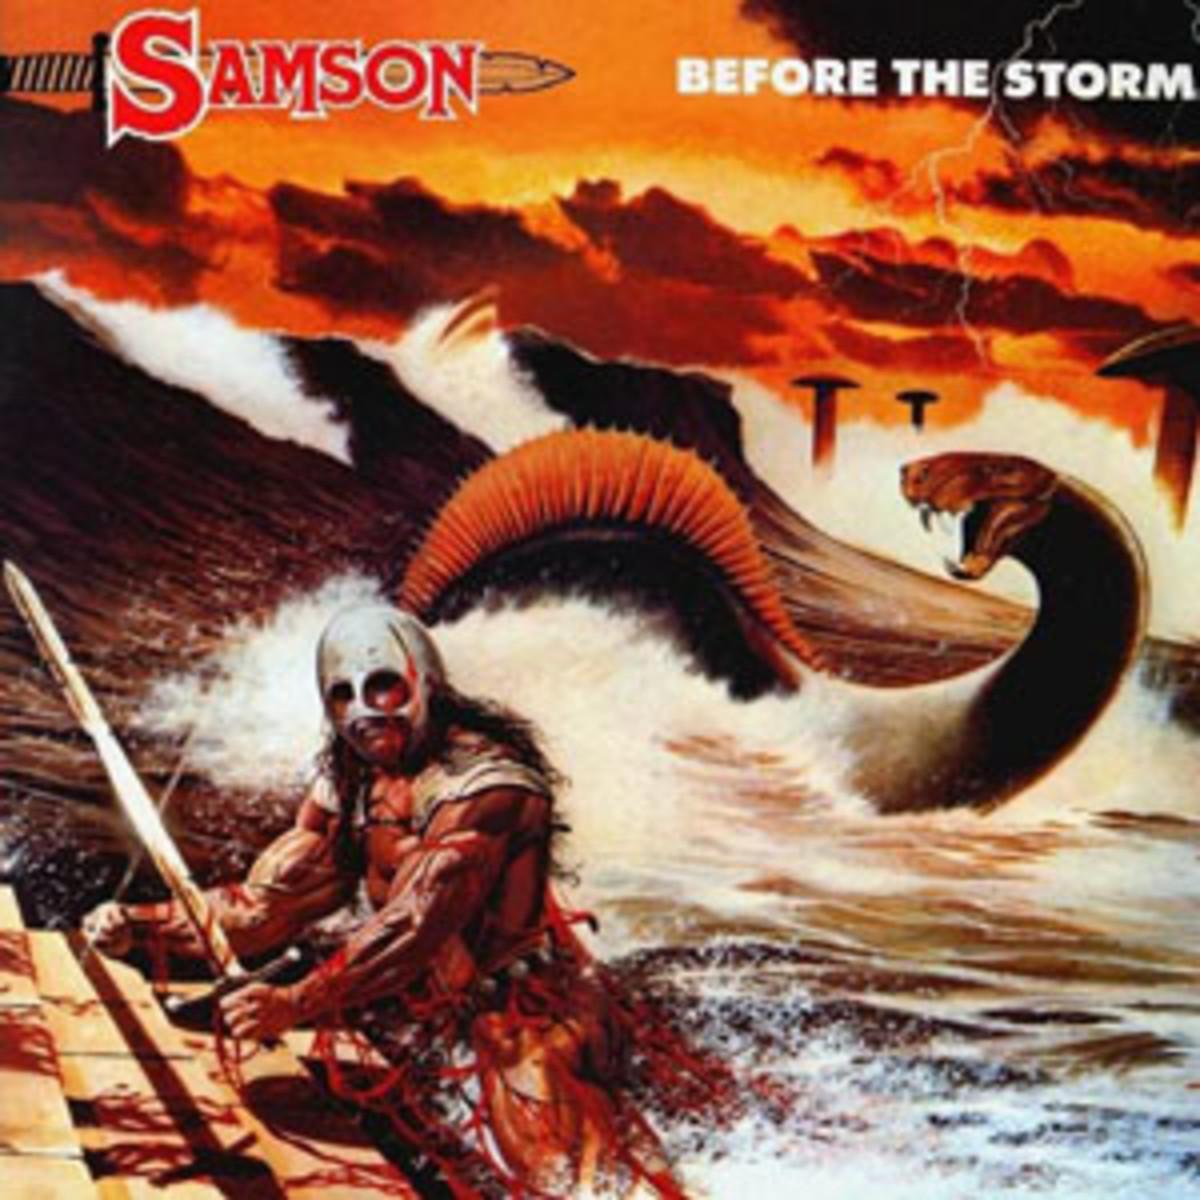 Samson_BeforeTheStorm